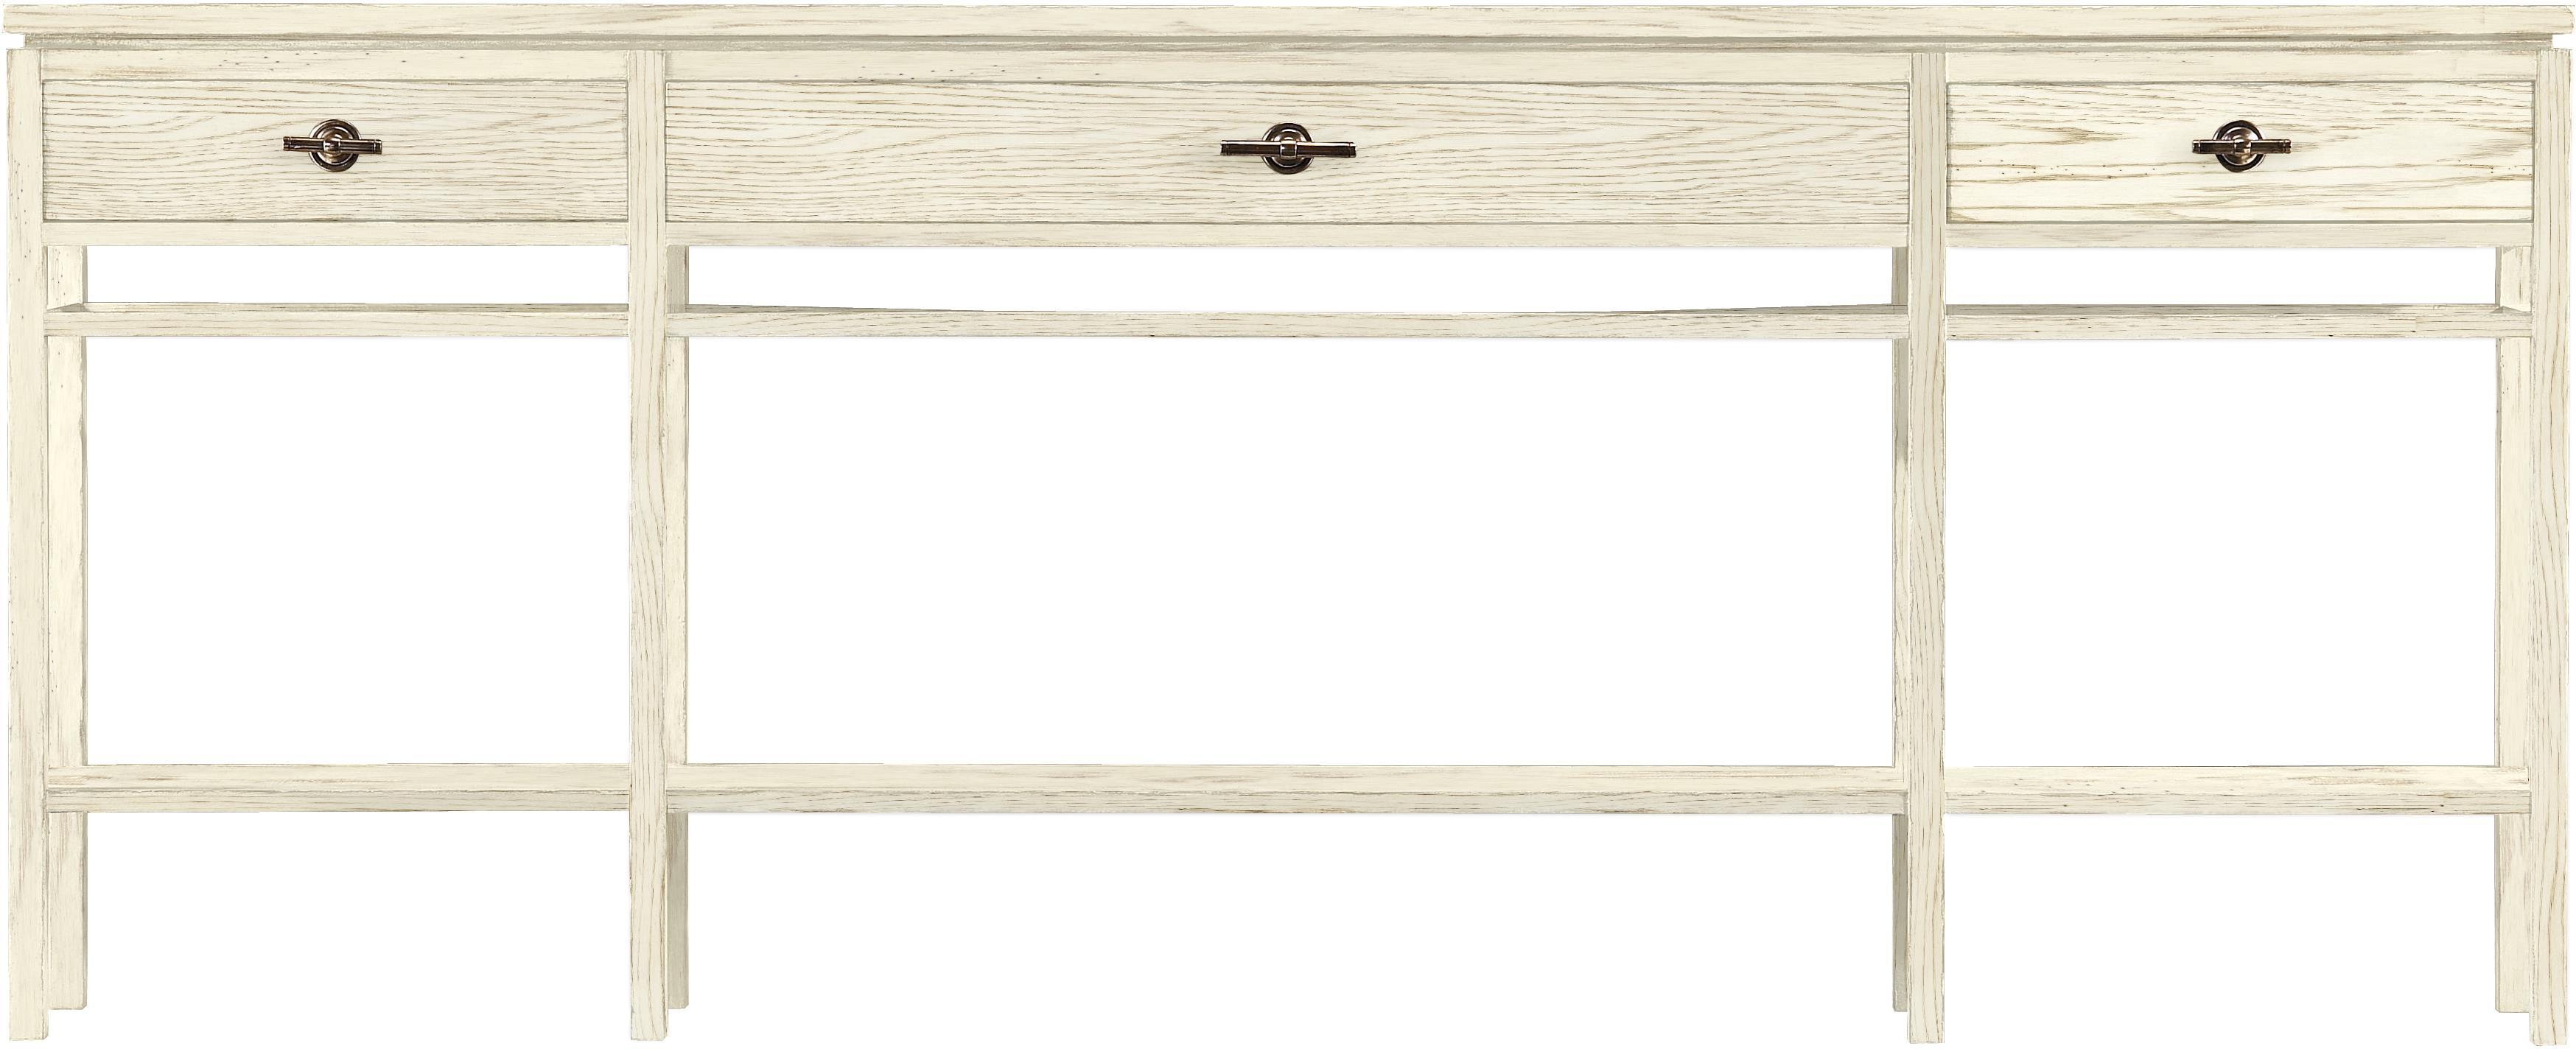 Stanley Furniture Coastal Living Resort Palisades Sofa Table - Item Number: 062-A5-05